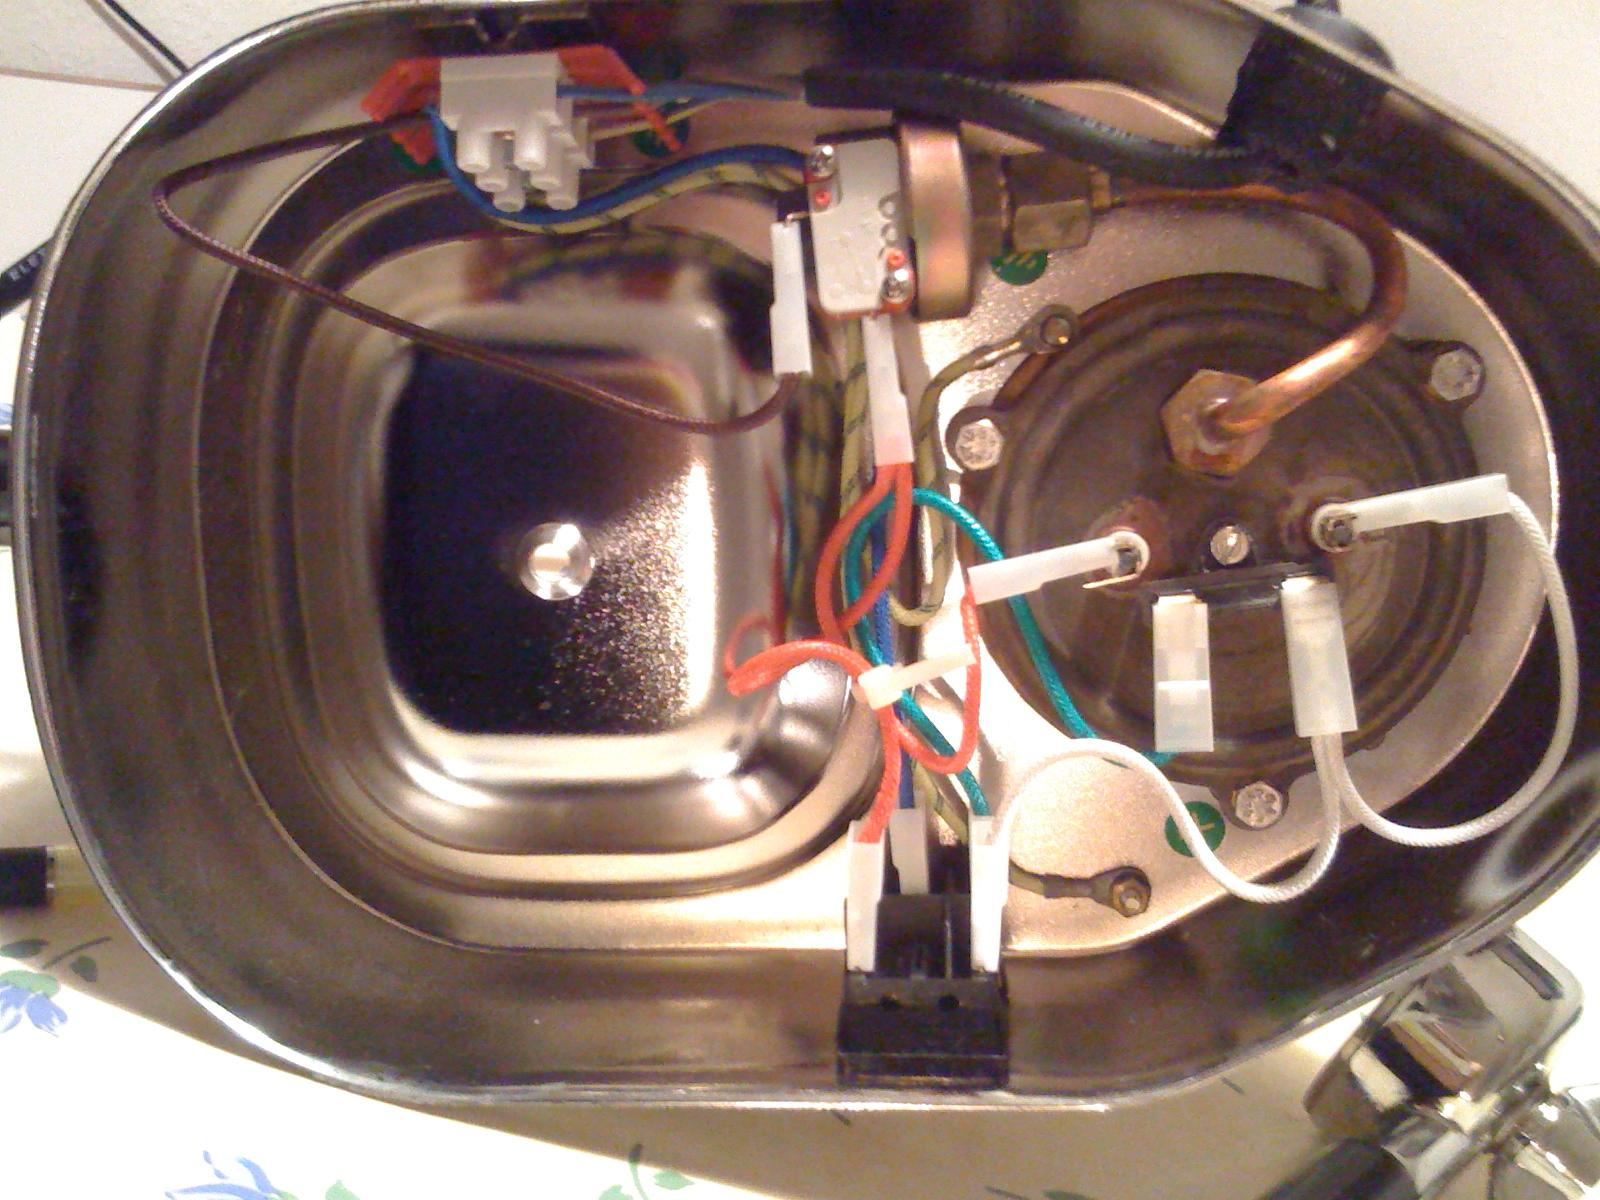 la pavoni europiccola wiring before  u2013 imrich net